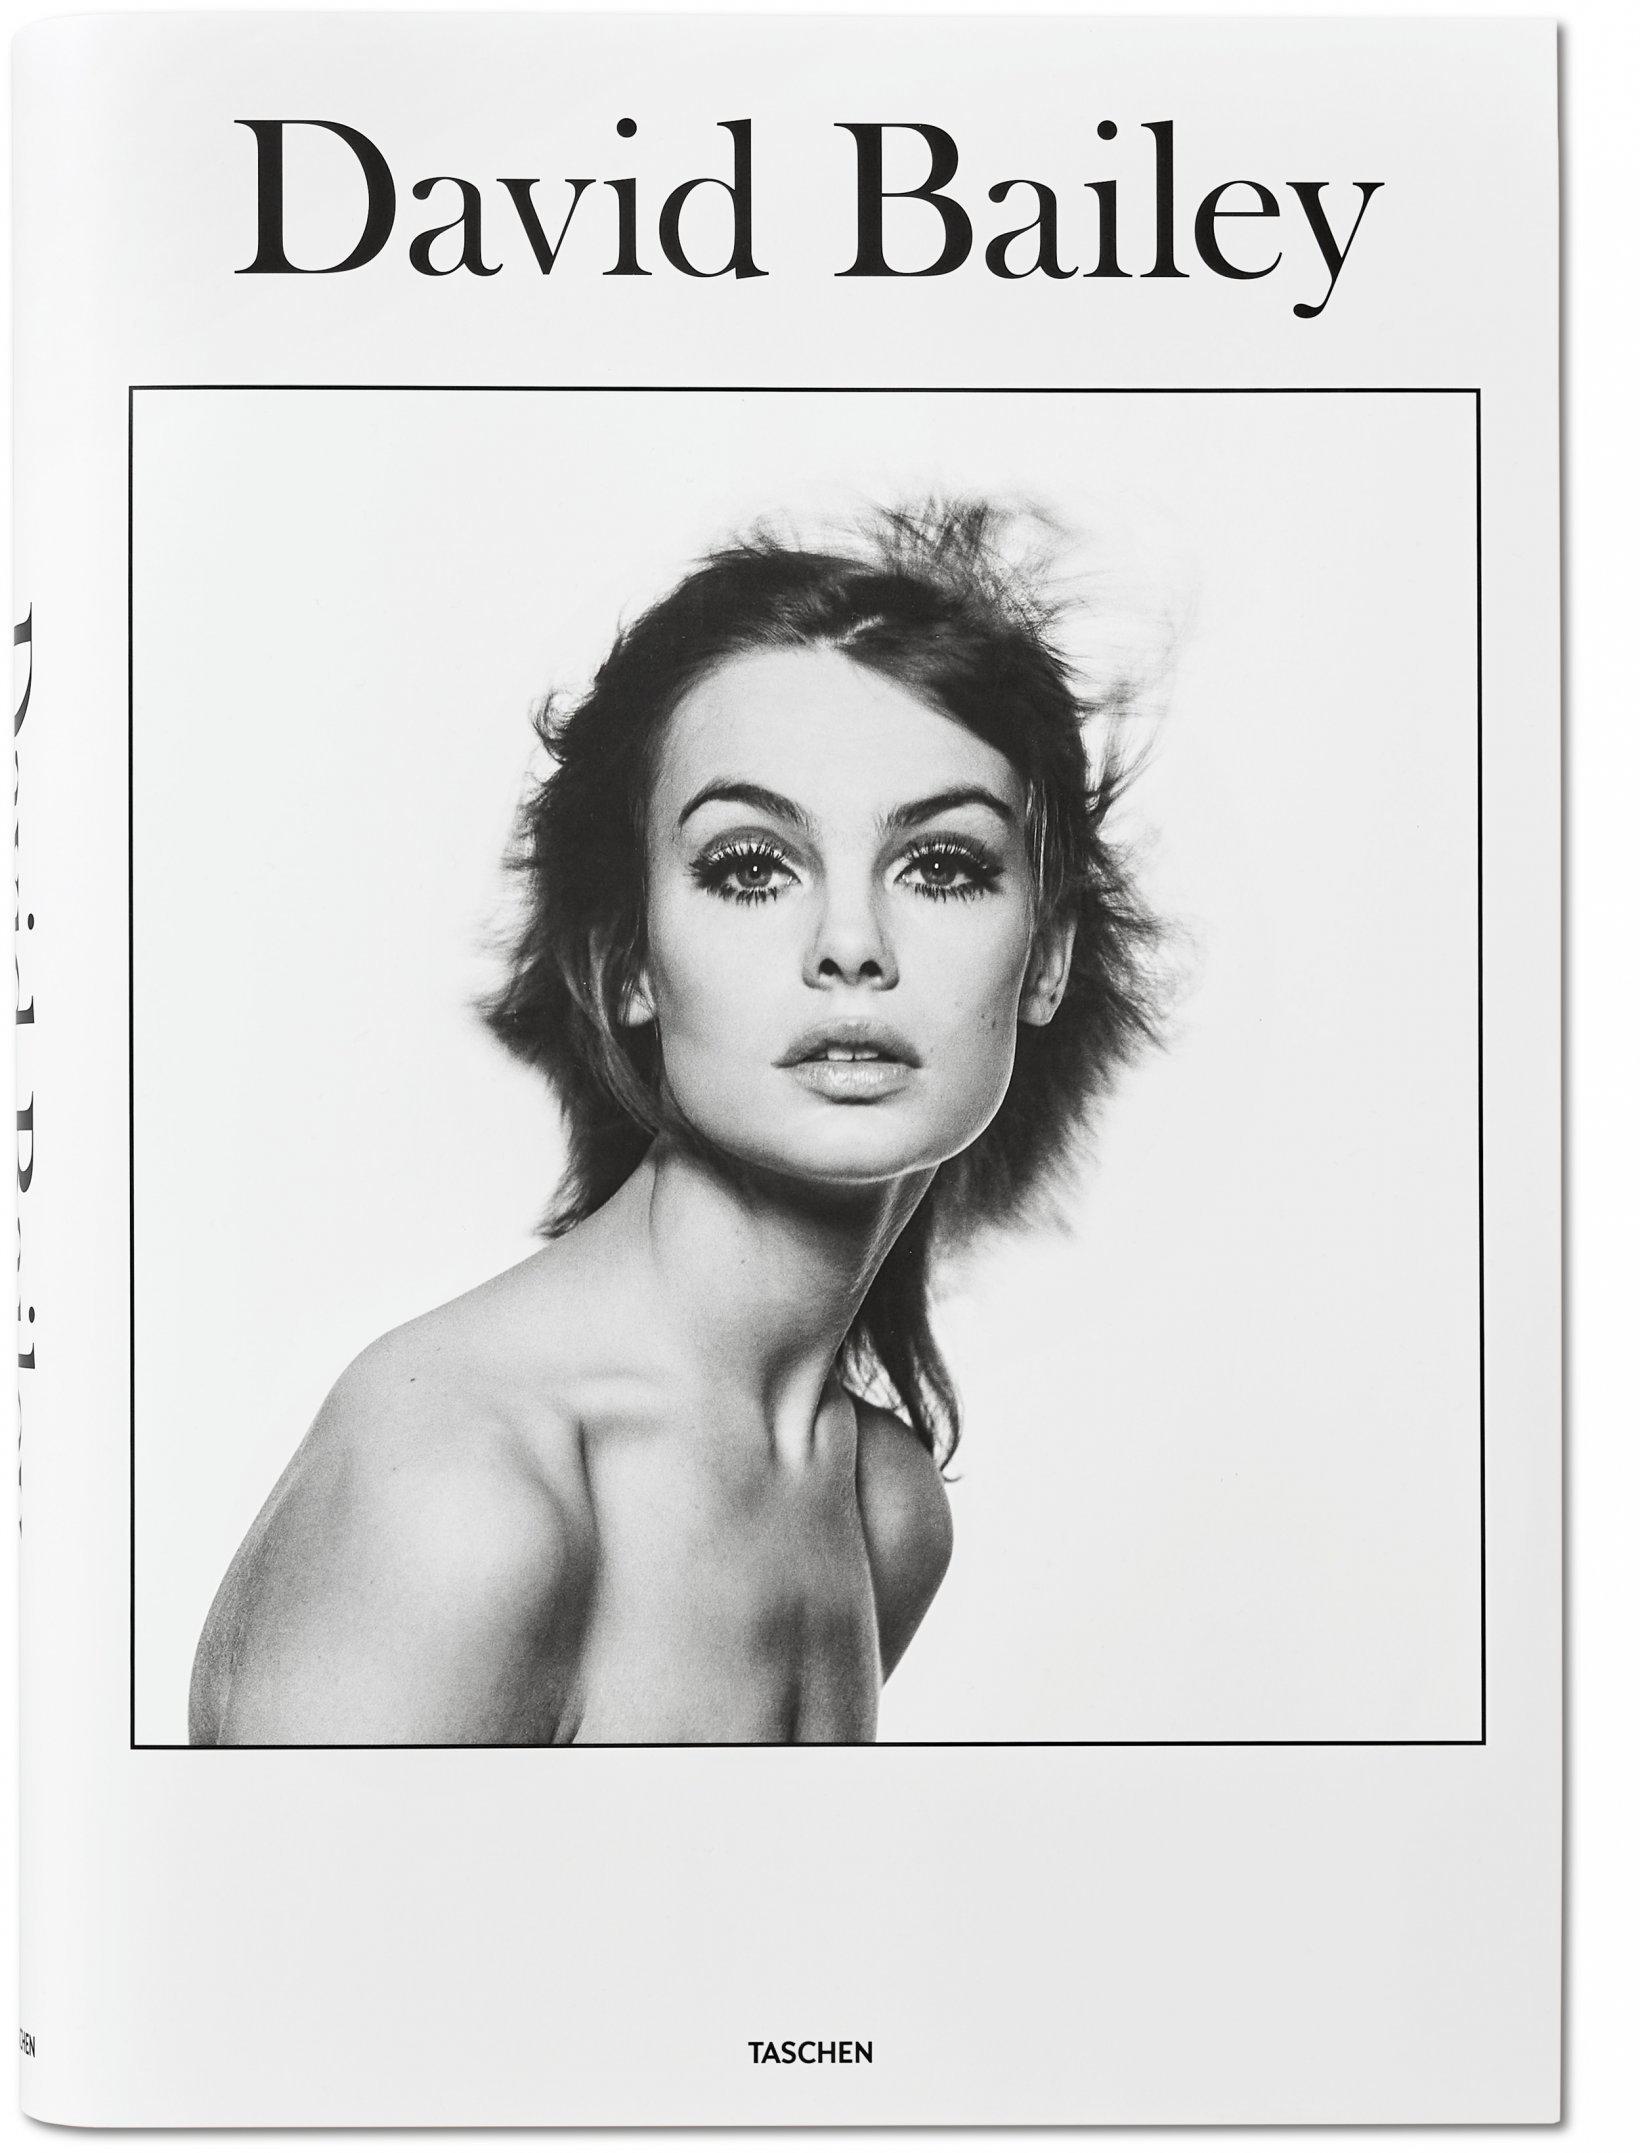 David Bailey Art Edition Jean Shrimpton Variant